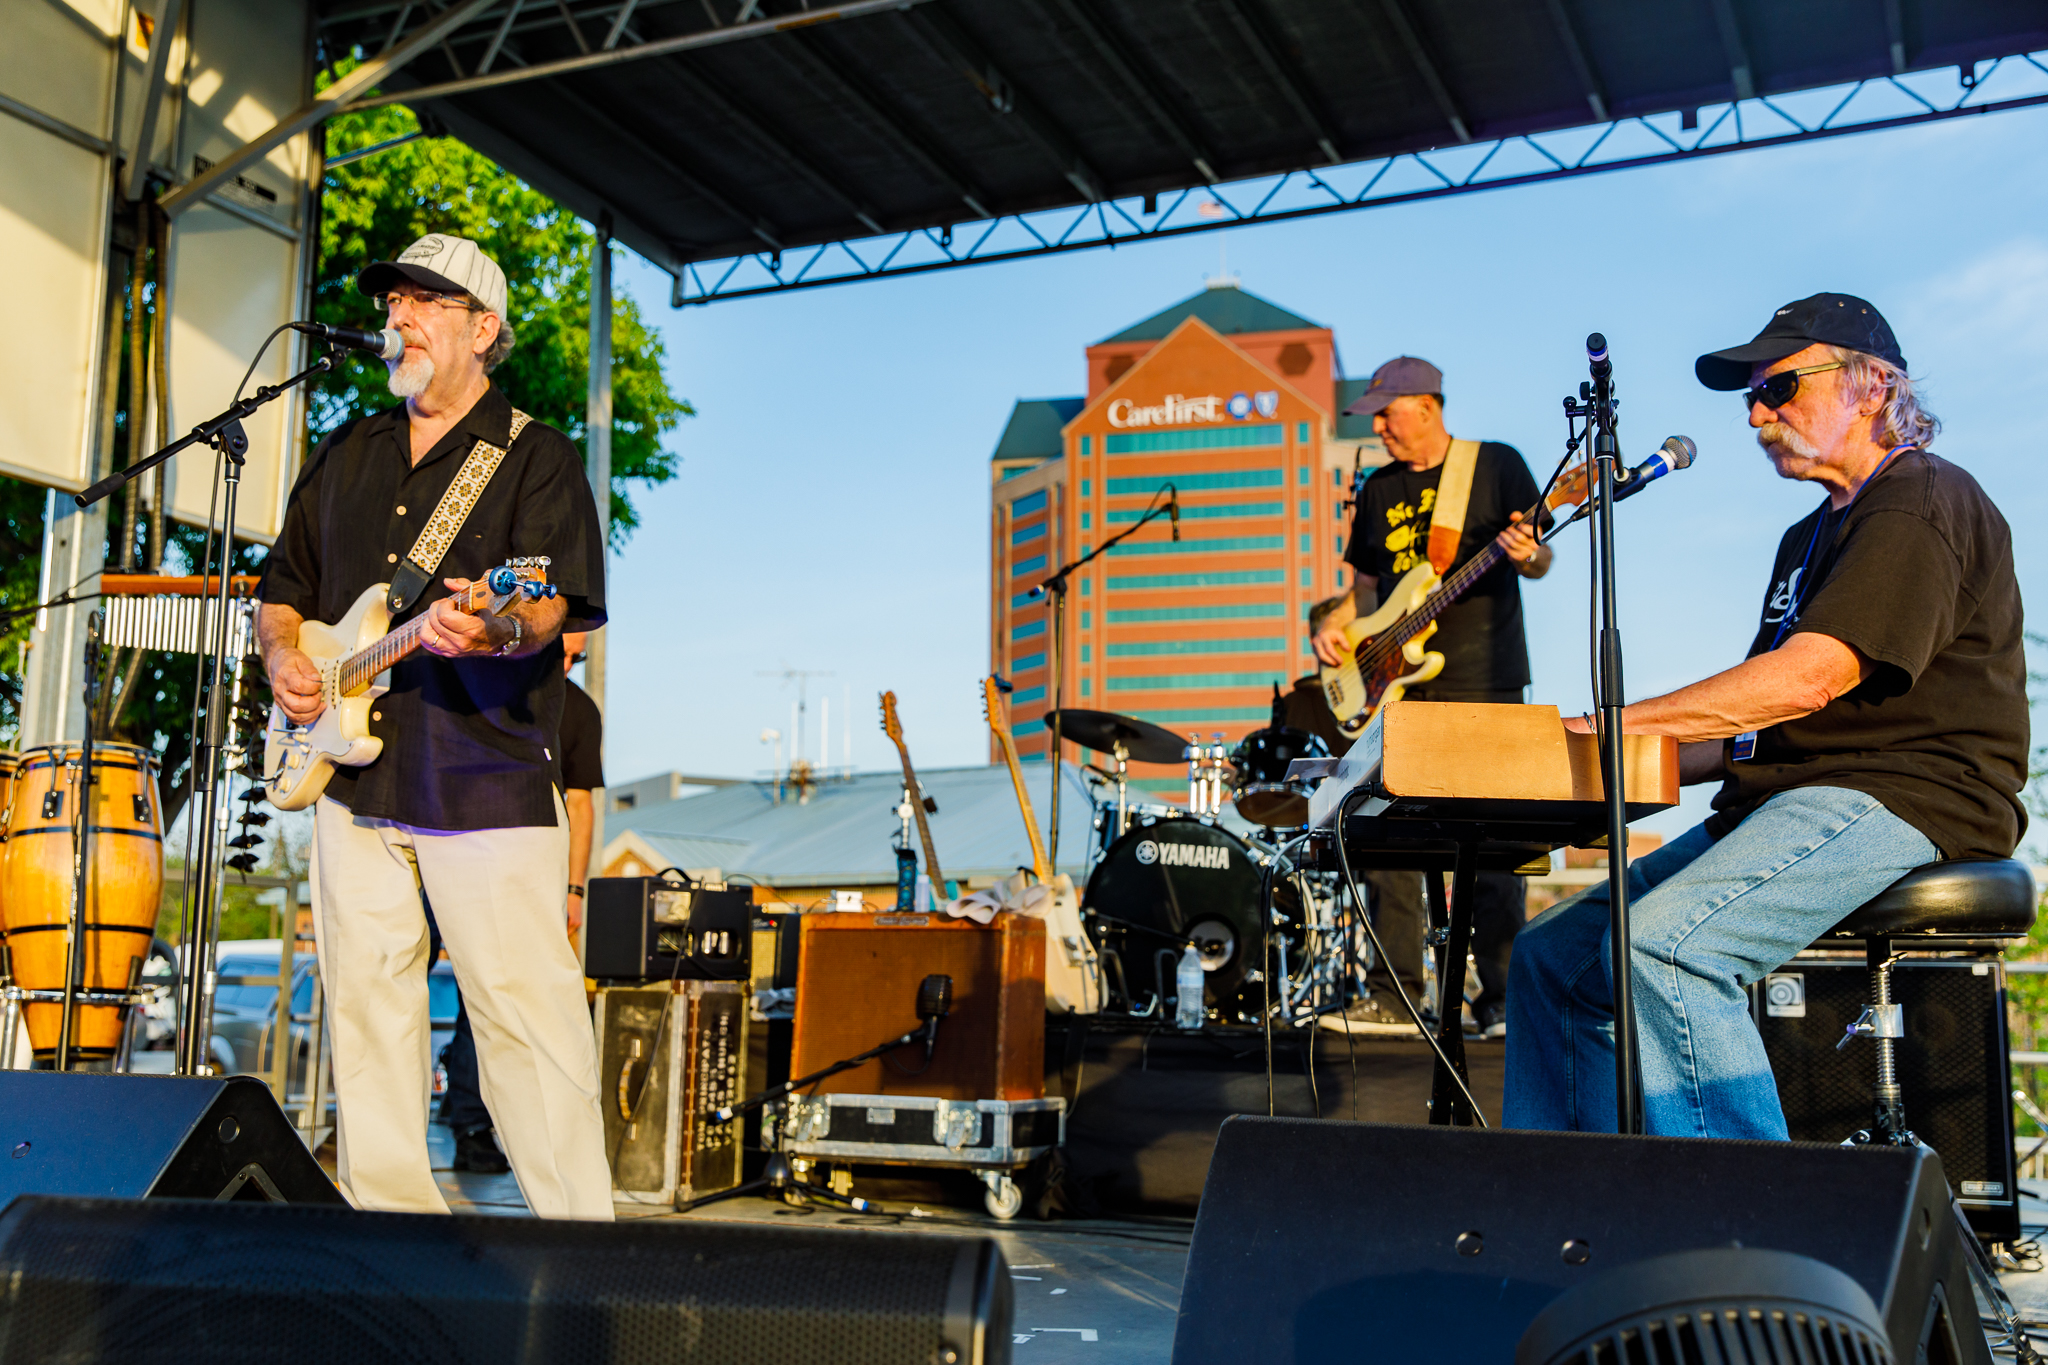 Tom Principato Band performing at WTMD First Thursday at Canton Waterfront Park, Baltimore - 5/3/2018 (photo by Matt Condon / @arcane93)